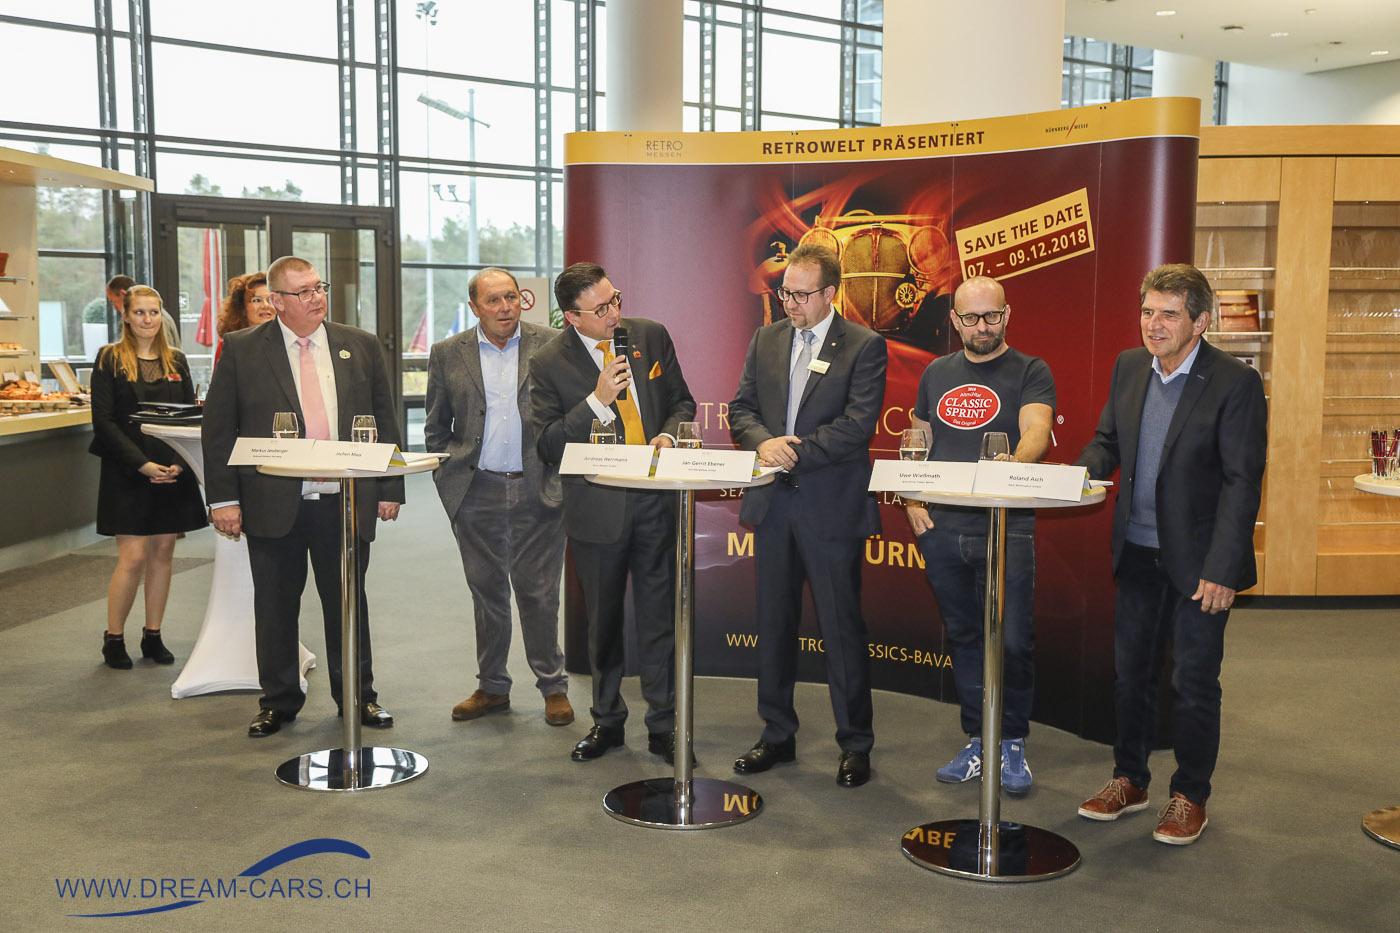 RETRO CLASSICS BAVARIA Nürnberg 2018